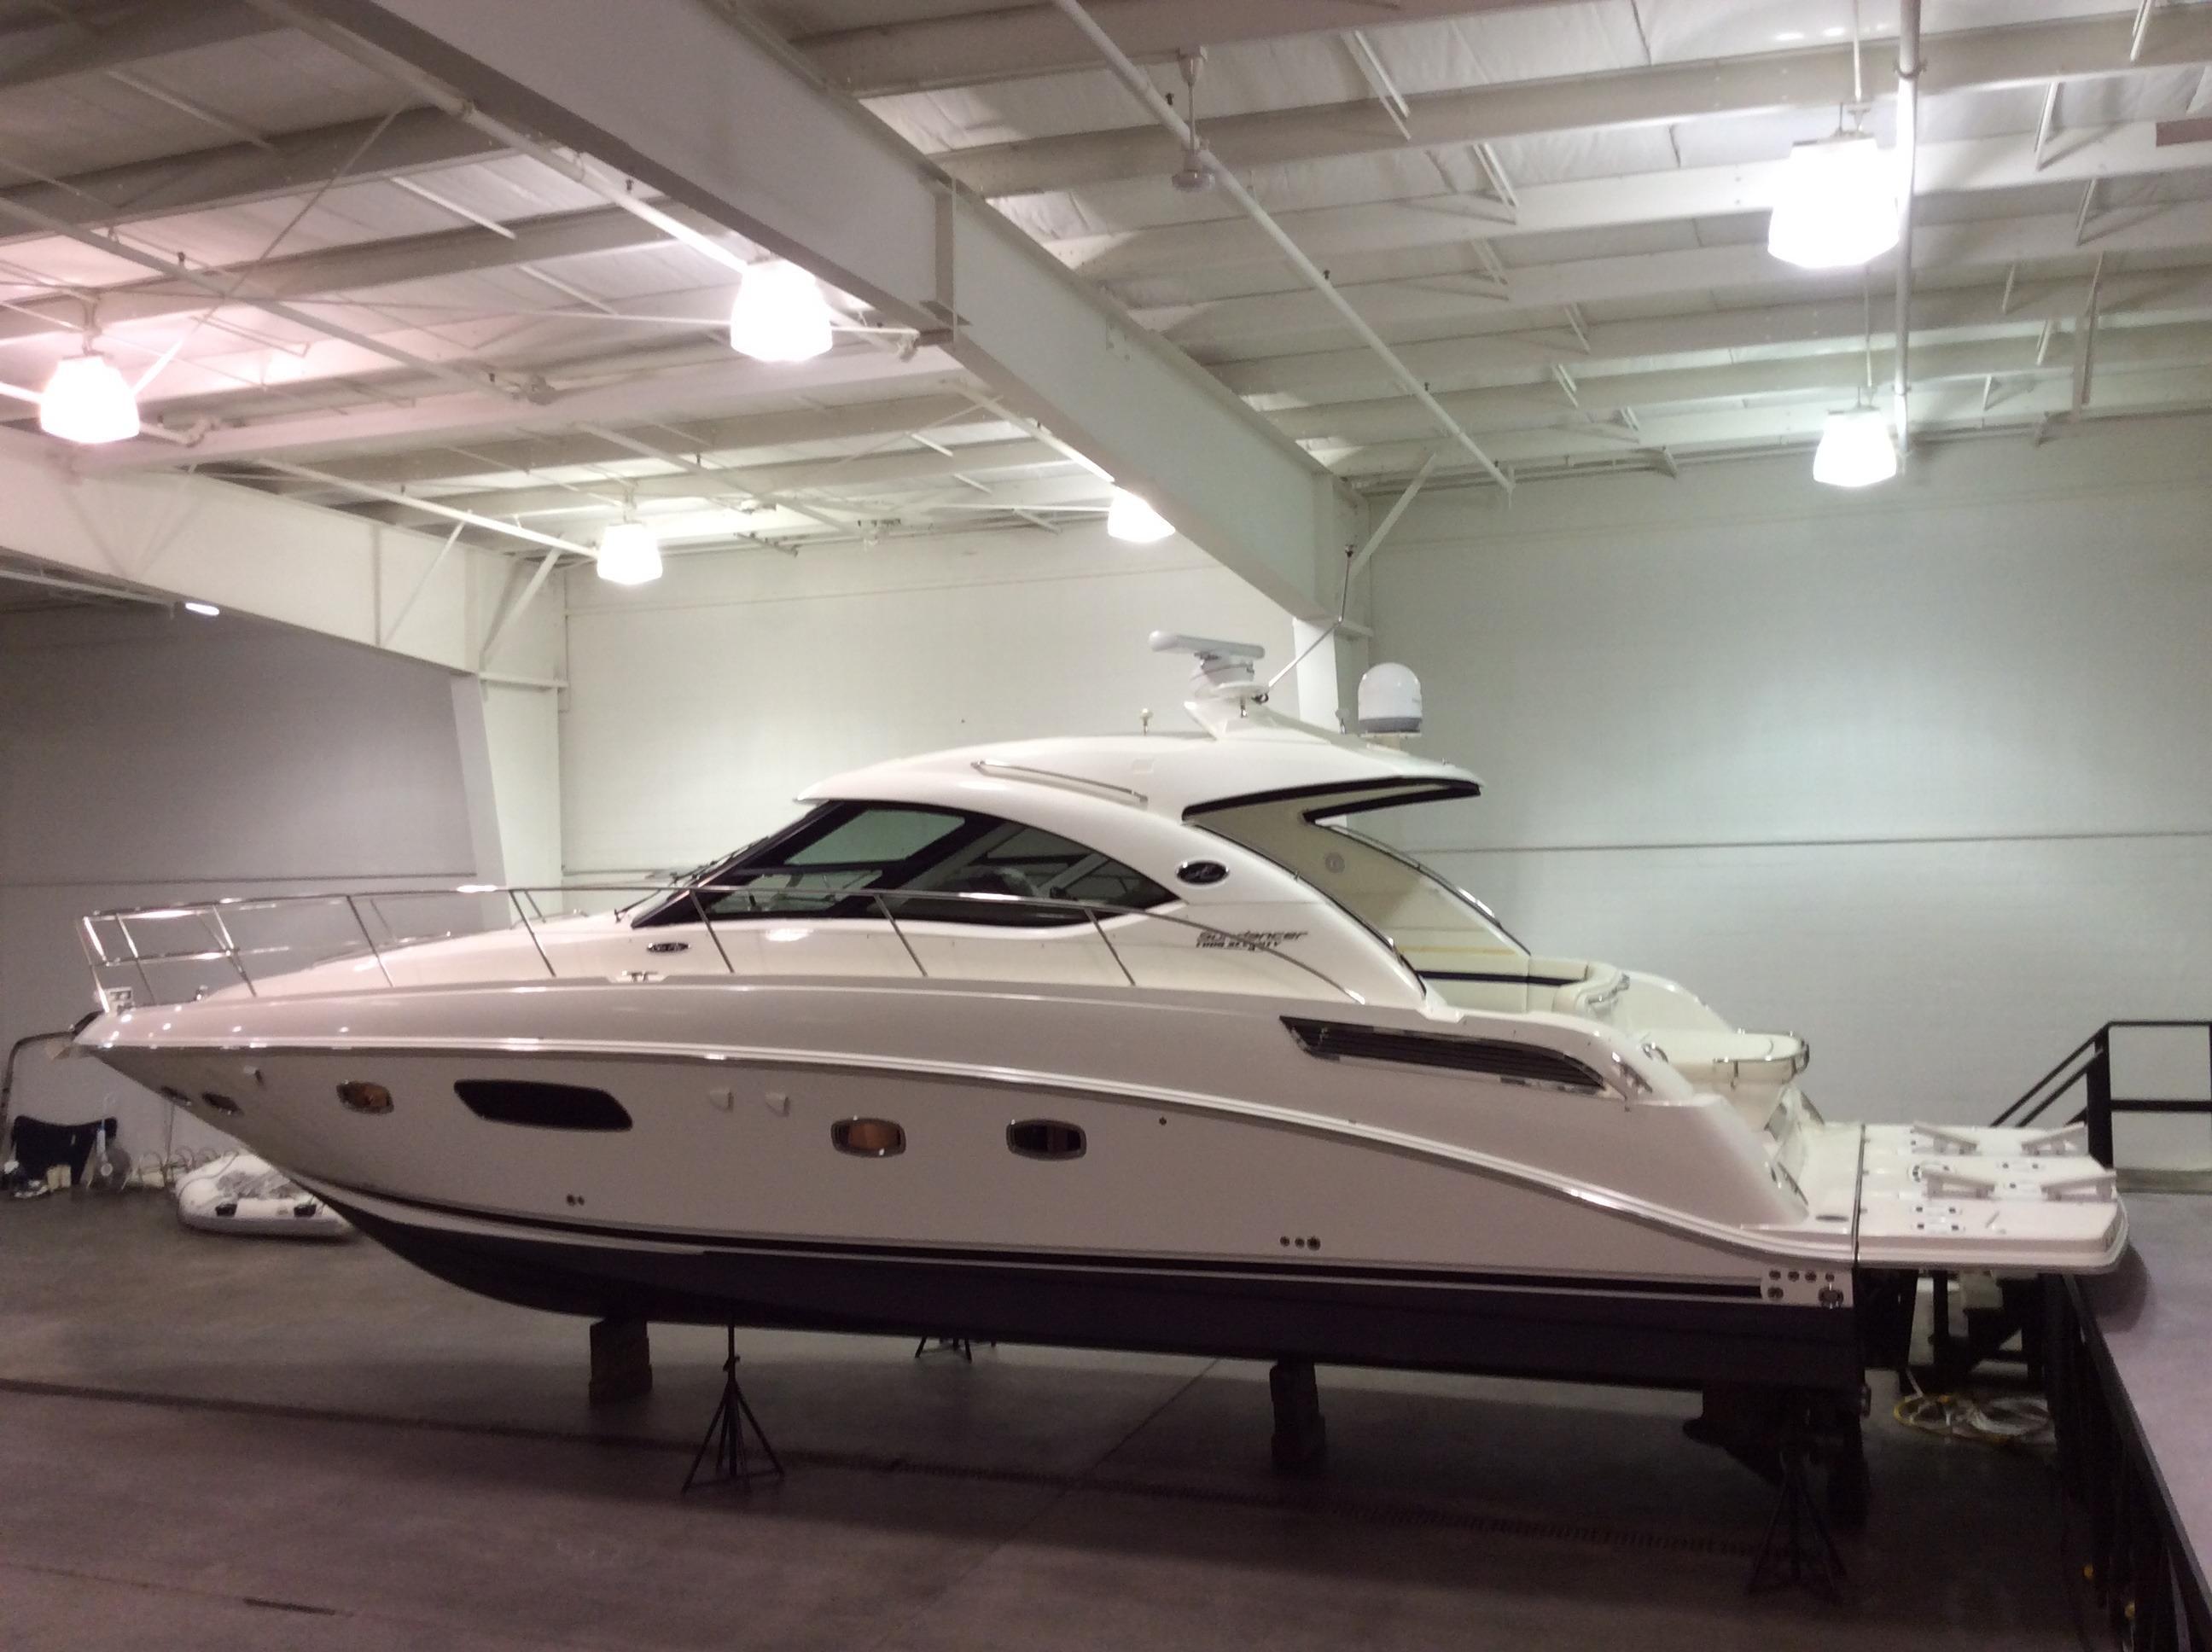 Yamaha Jet Boats For Sale Ct